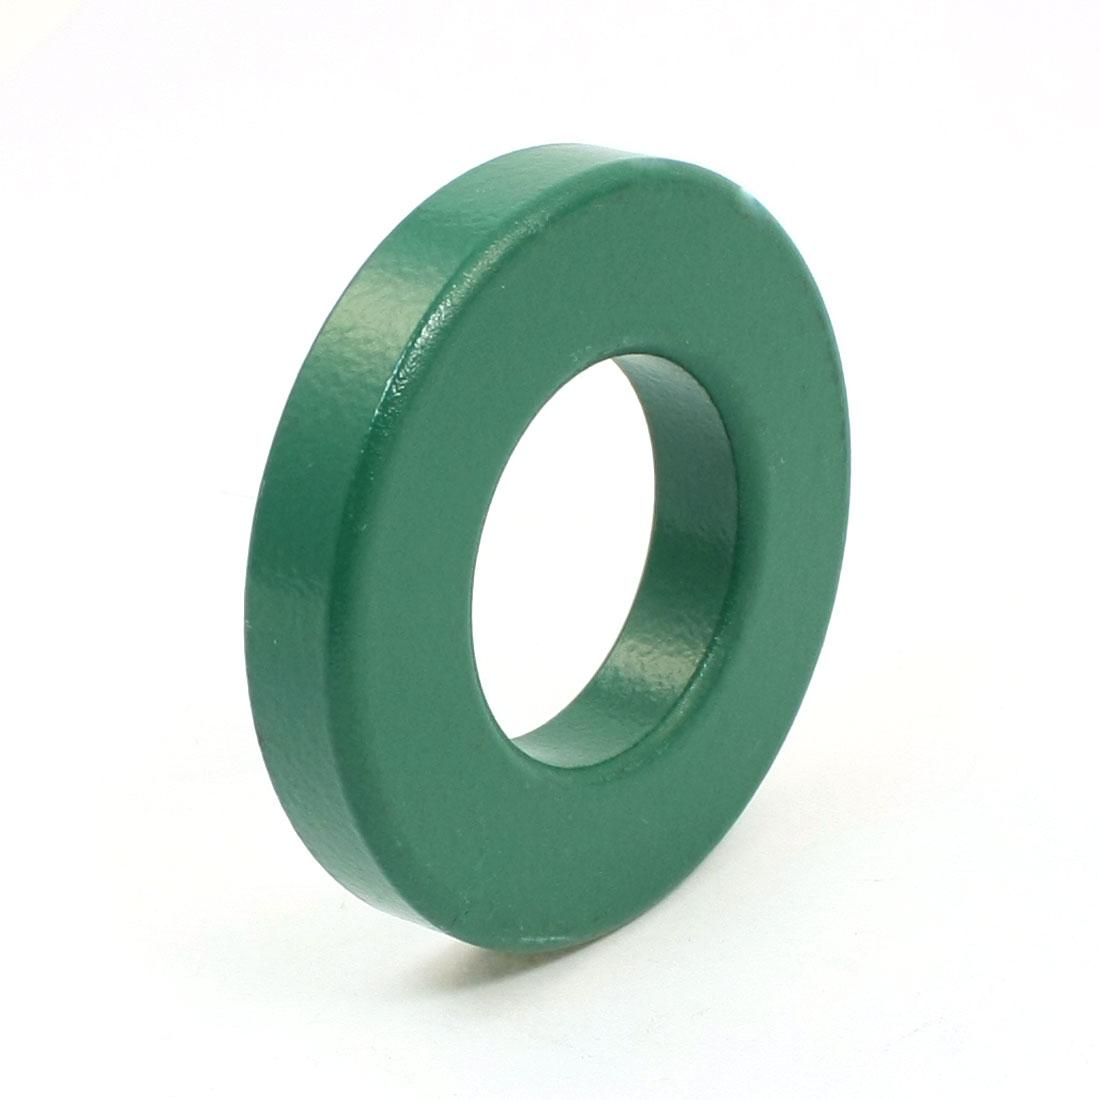 74 x 38 x 13mm Green Magnetism Ferrite Ring Core Tube Toroids